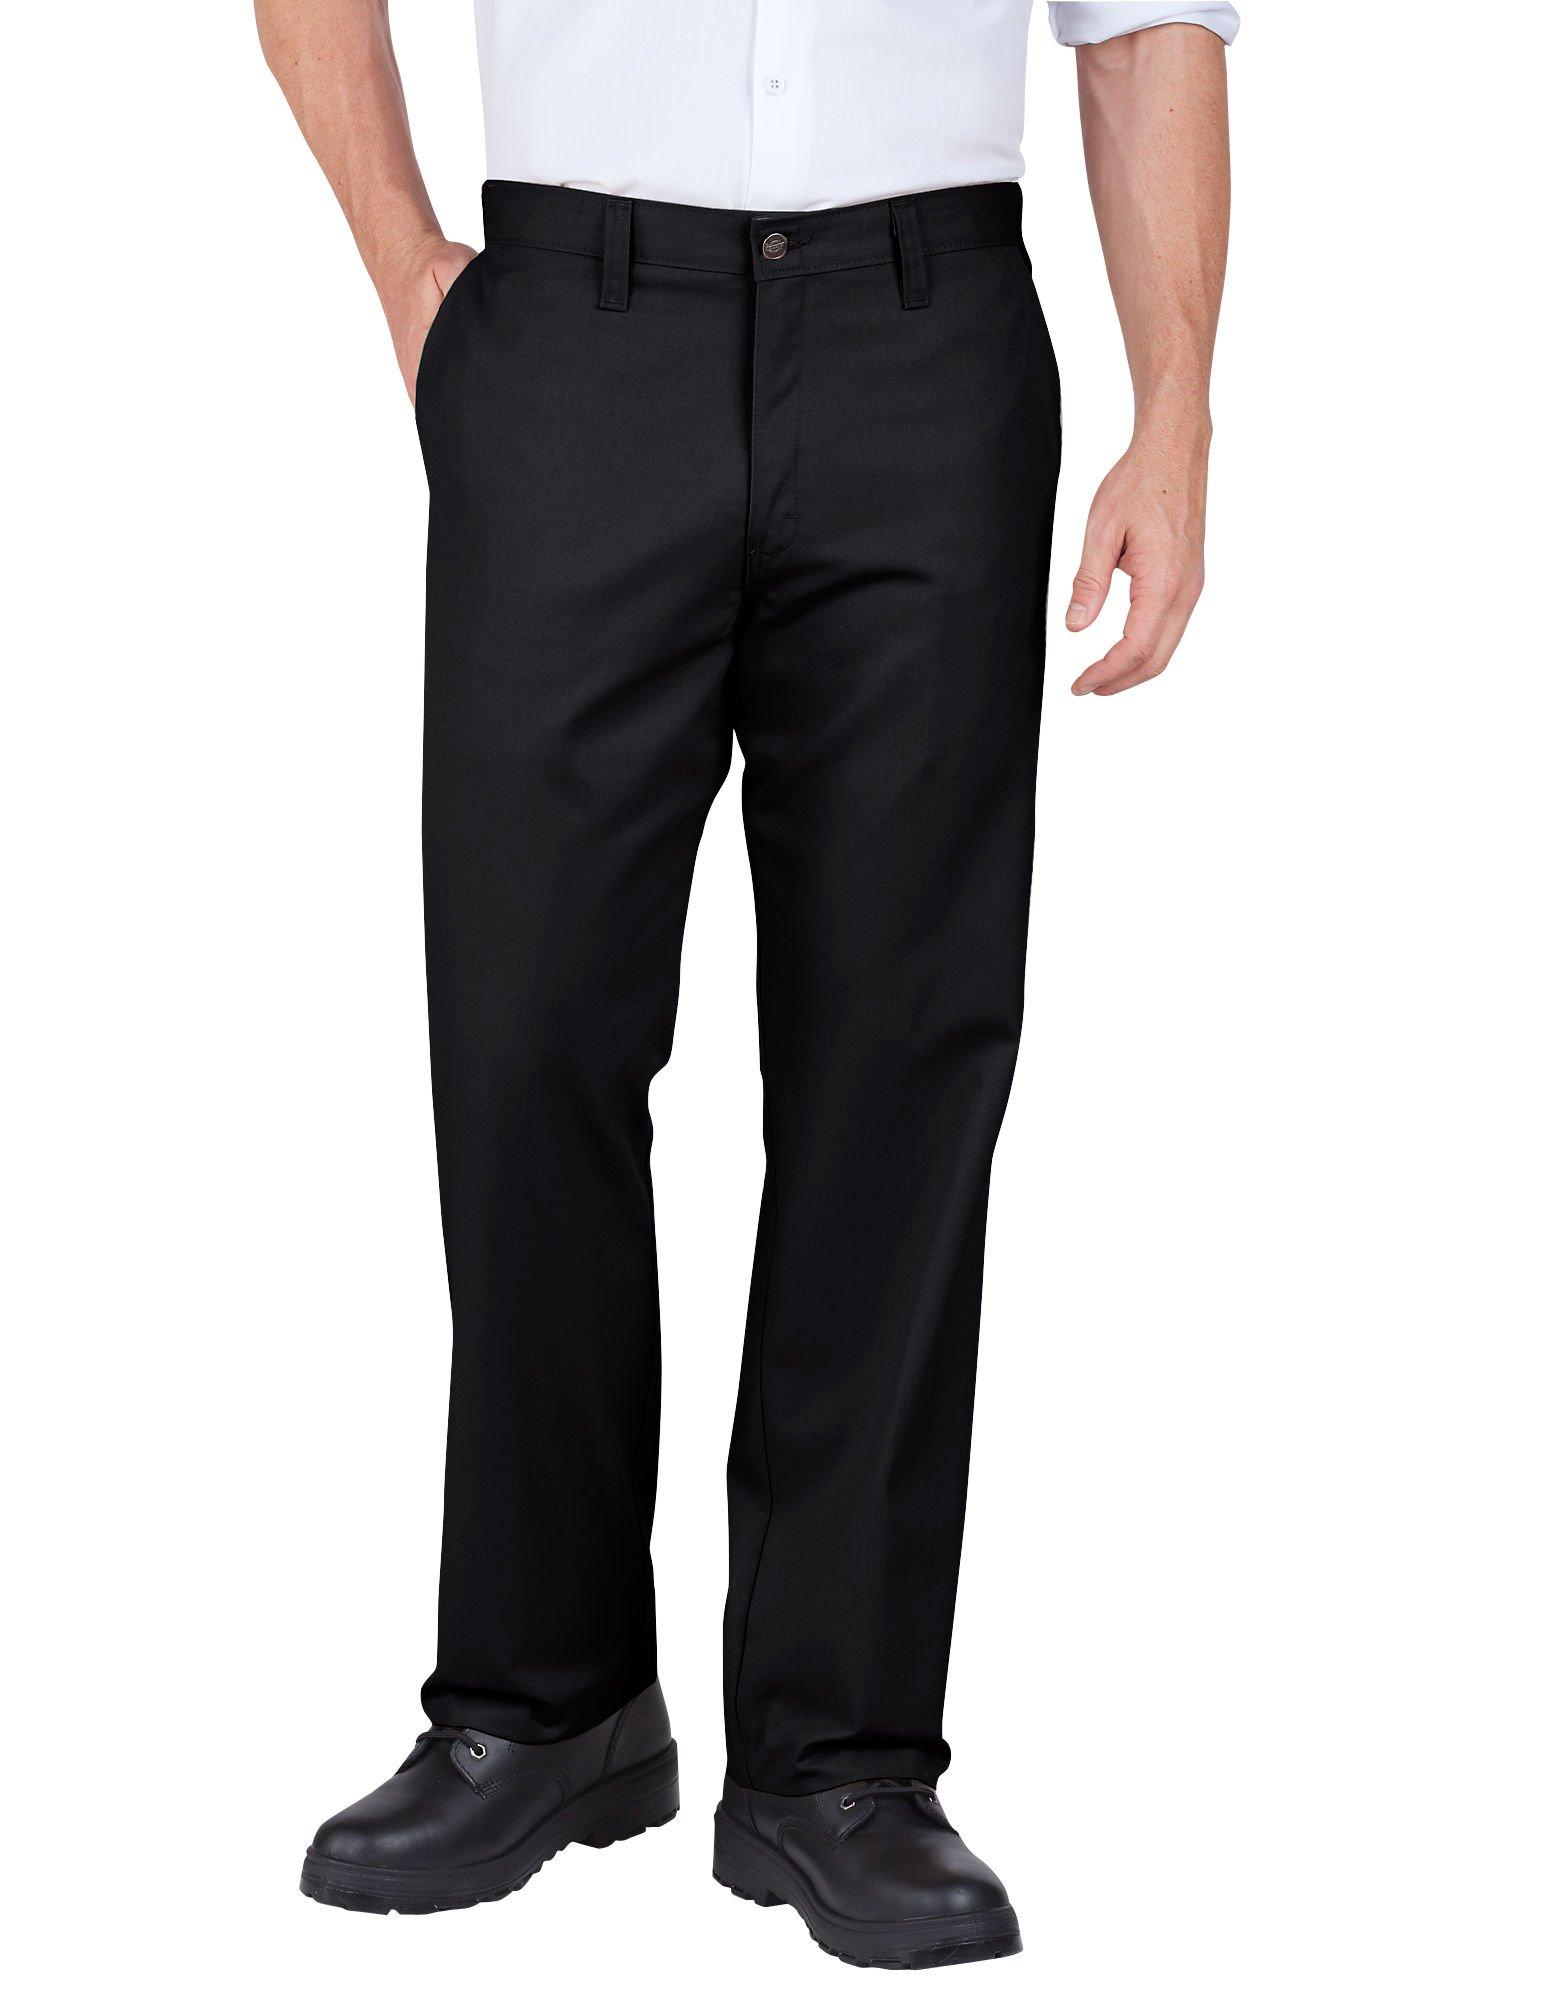 Dickies 2112272BK Men's Premium Industrial Multi-Use Pocket Pant